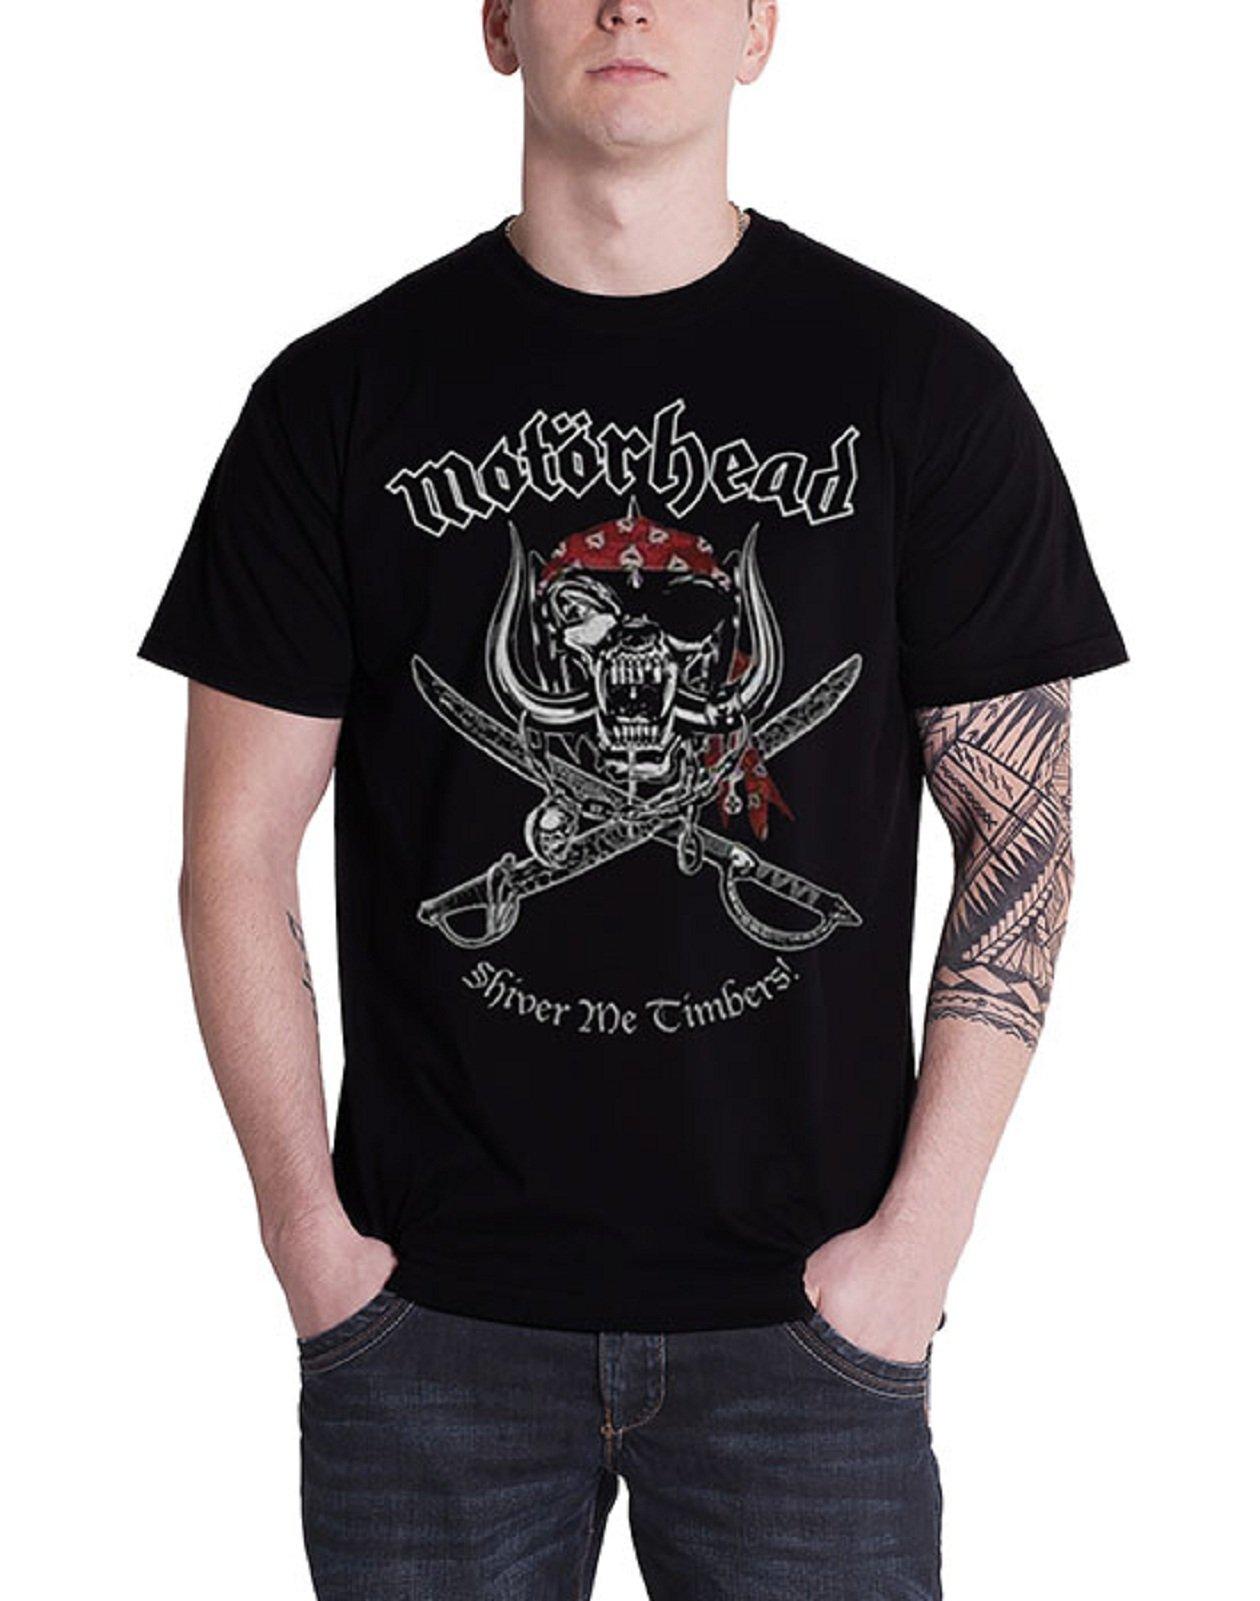 Motorhead T Shirt Shiver Me Timbers Pirate Band Logo S 1869